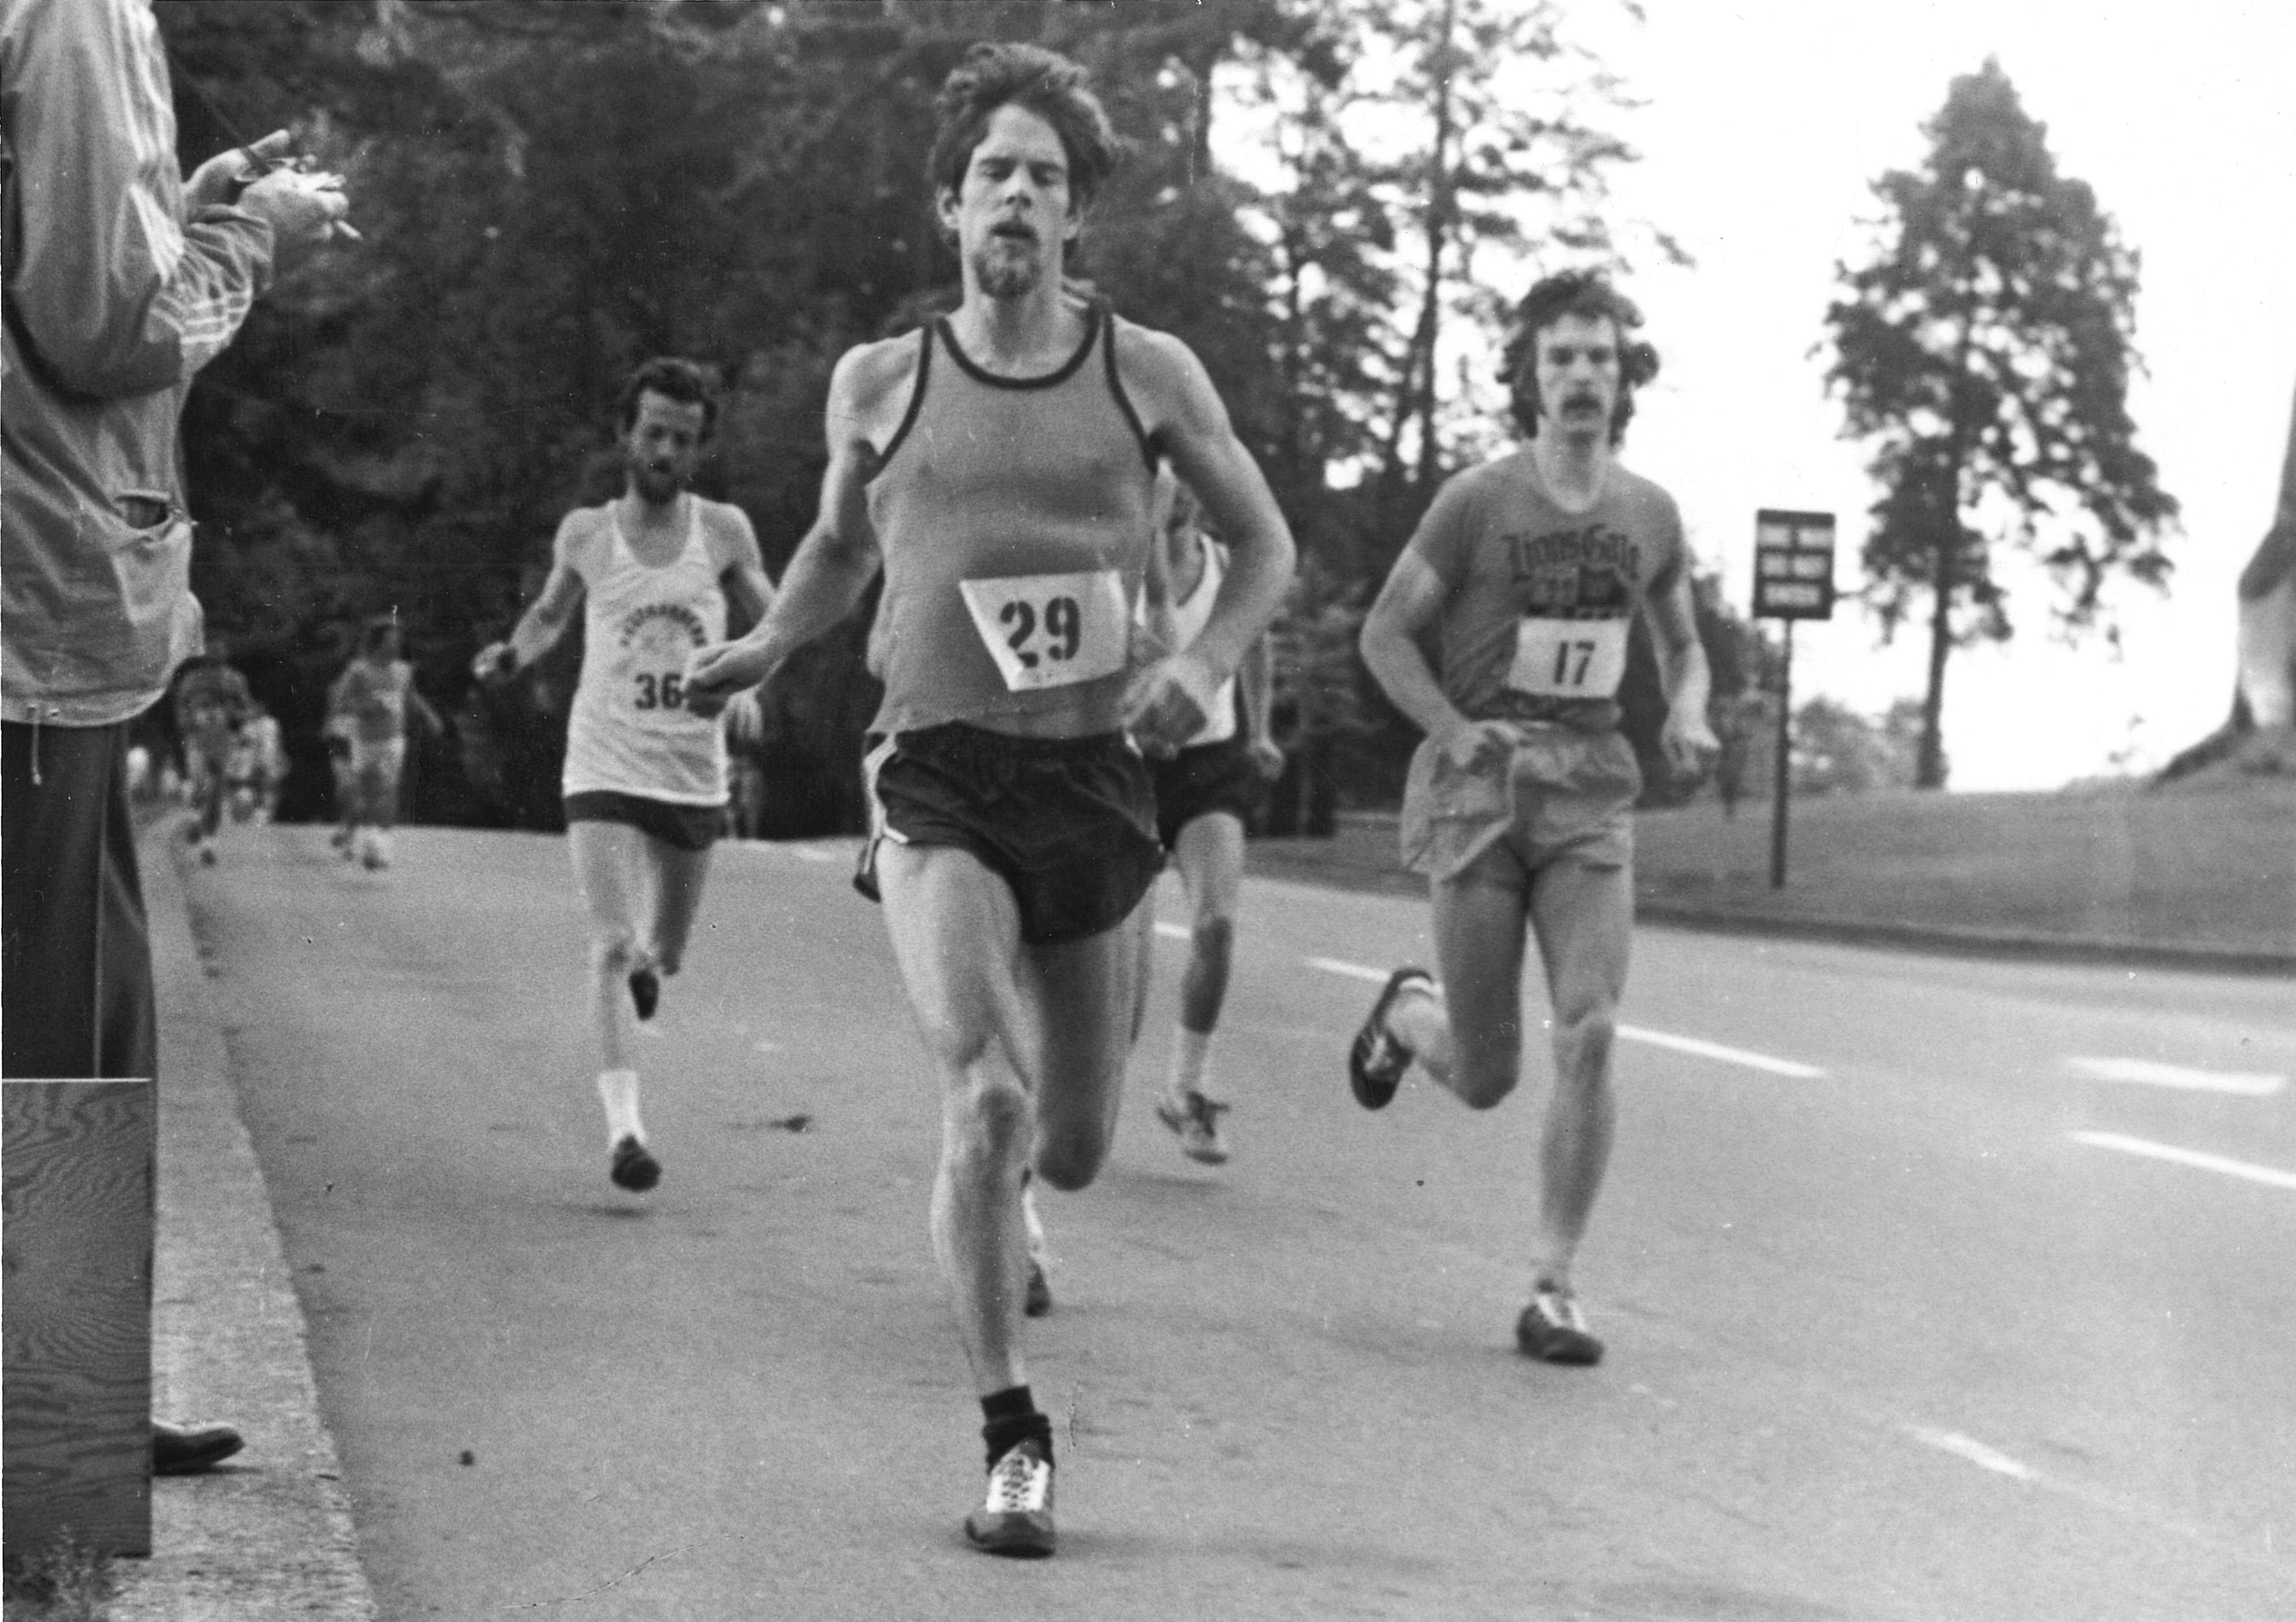 1973Vancouver Marathon - Bill Herriot (36) Tom Howard (29) Jack Taunton (17)